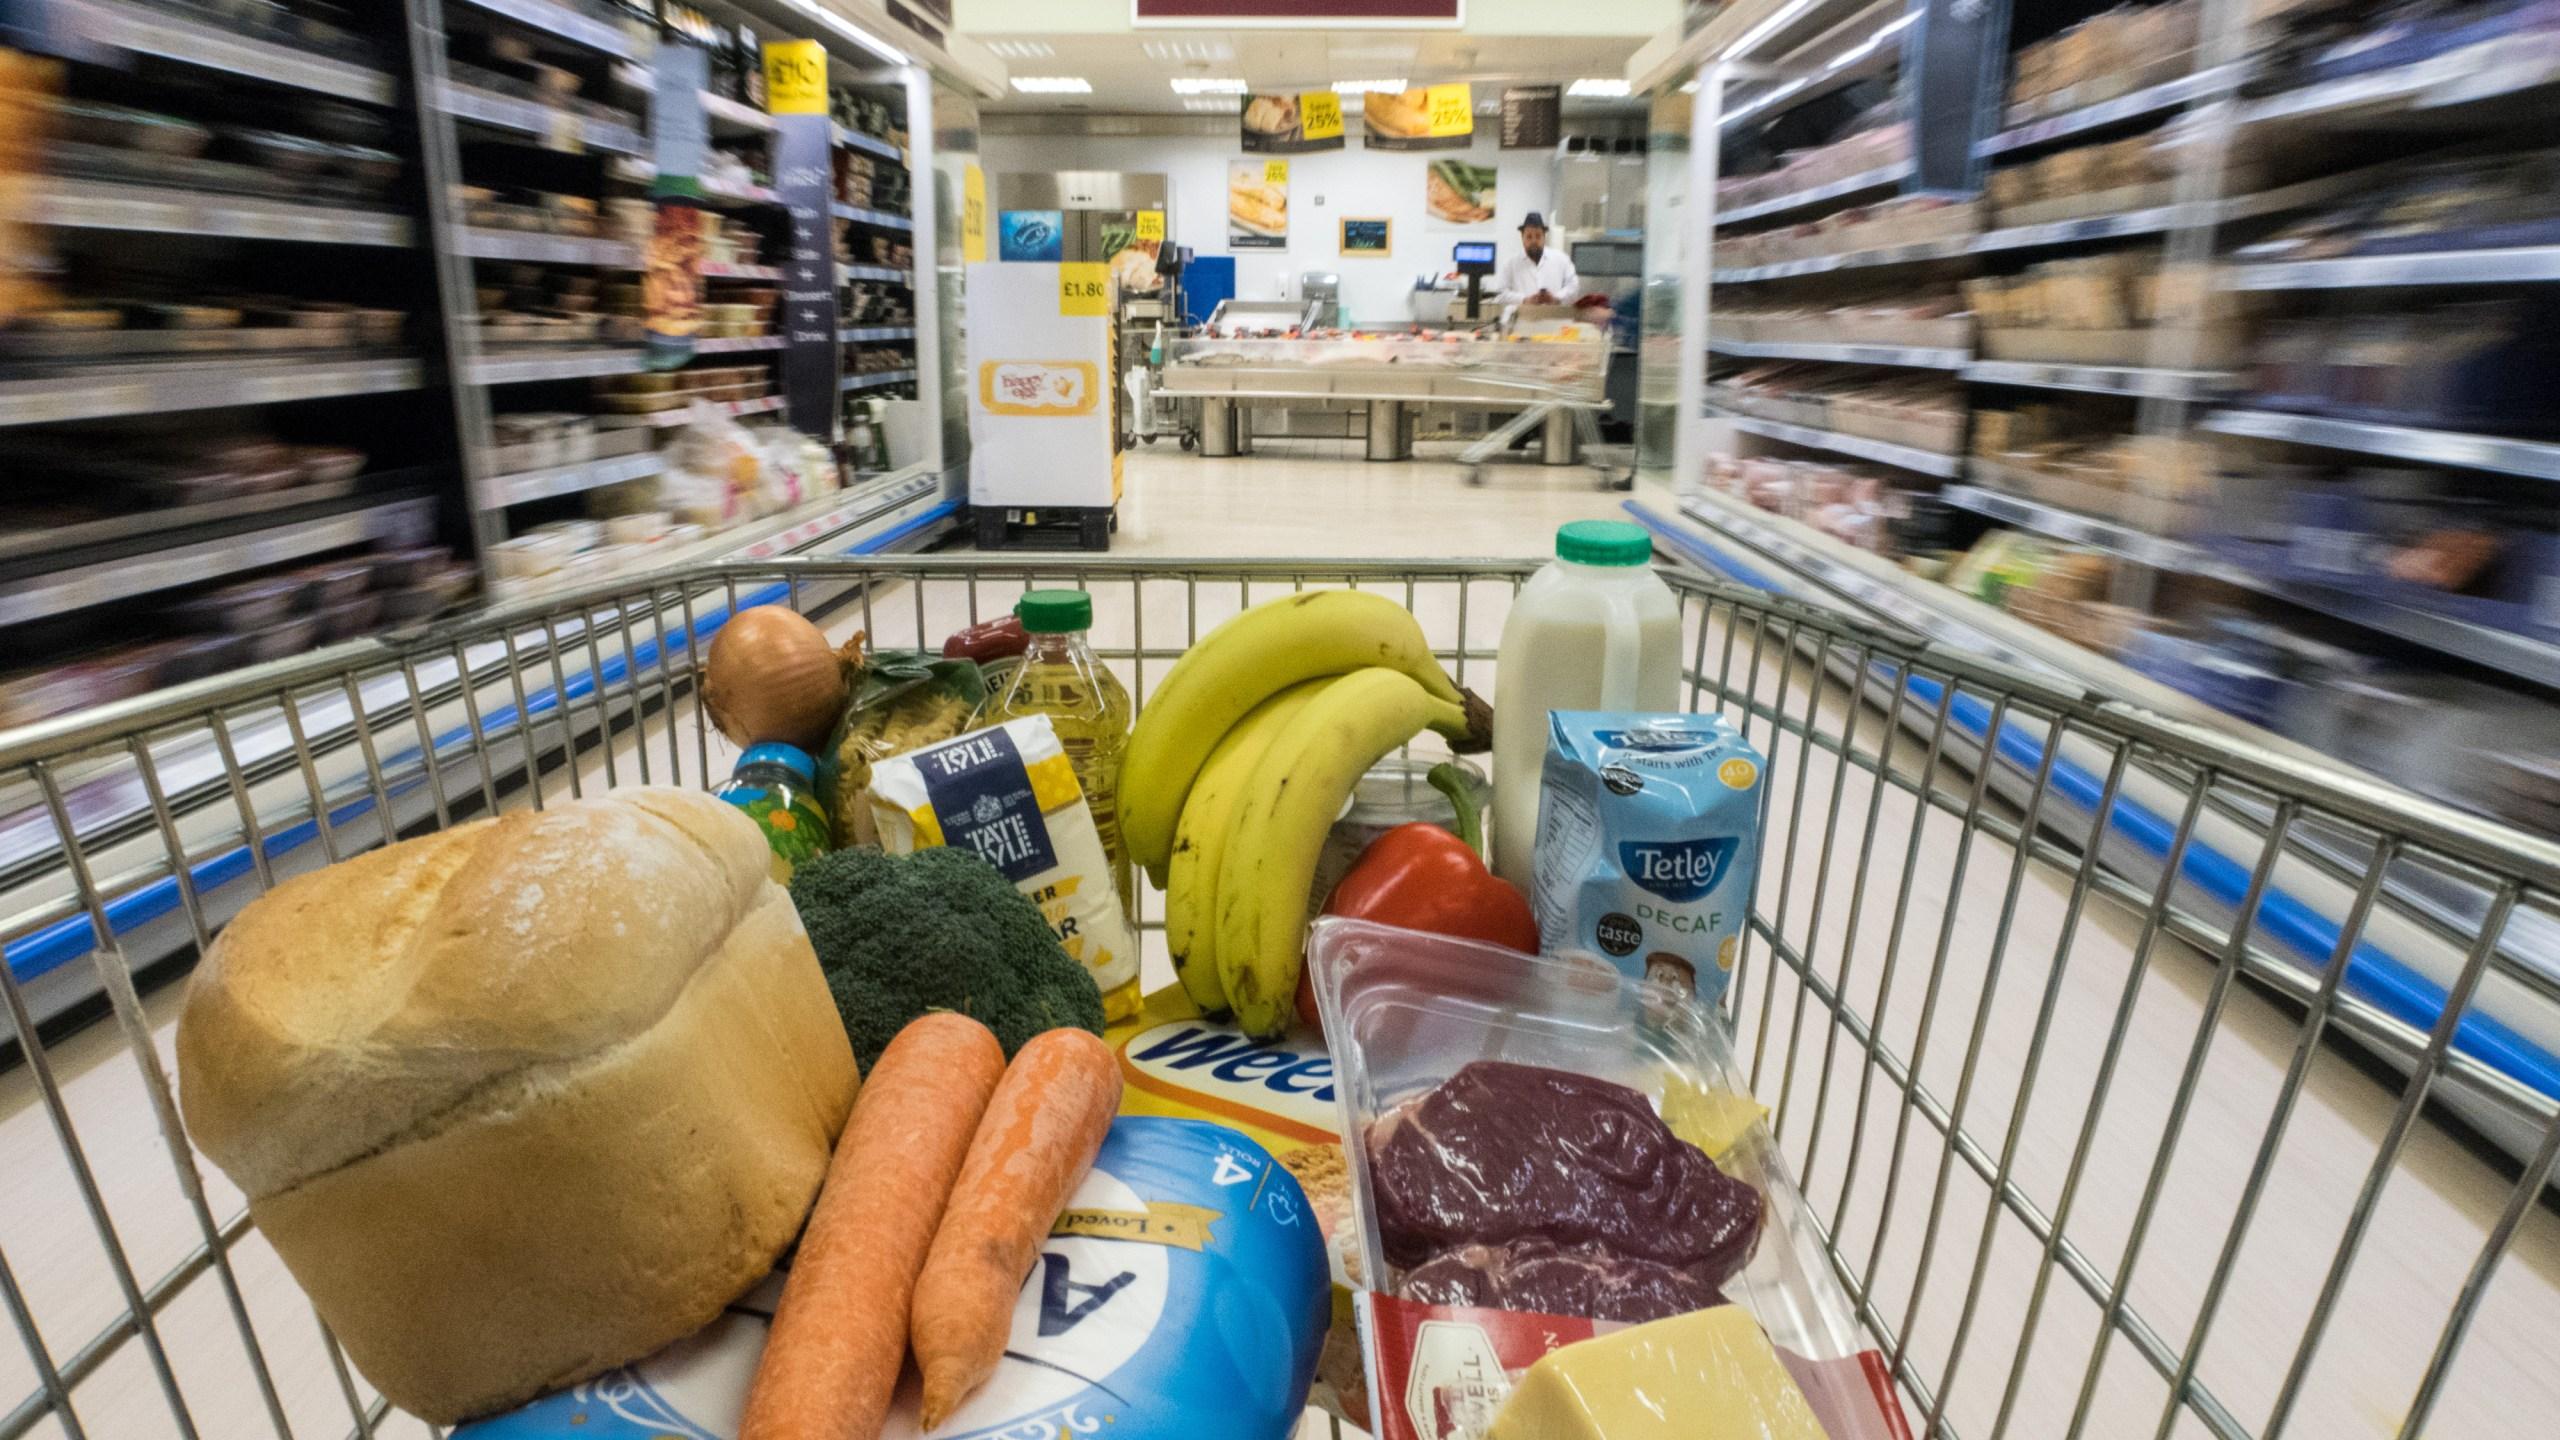 Shopping cart food_1559749749447